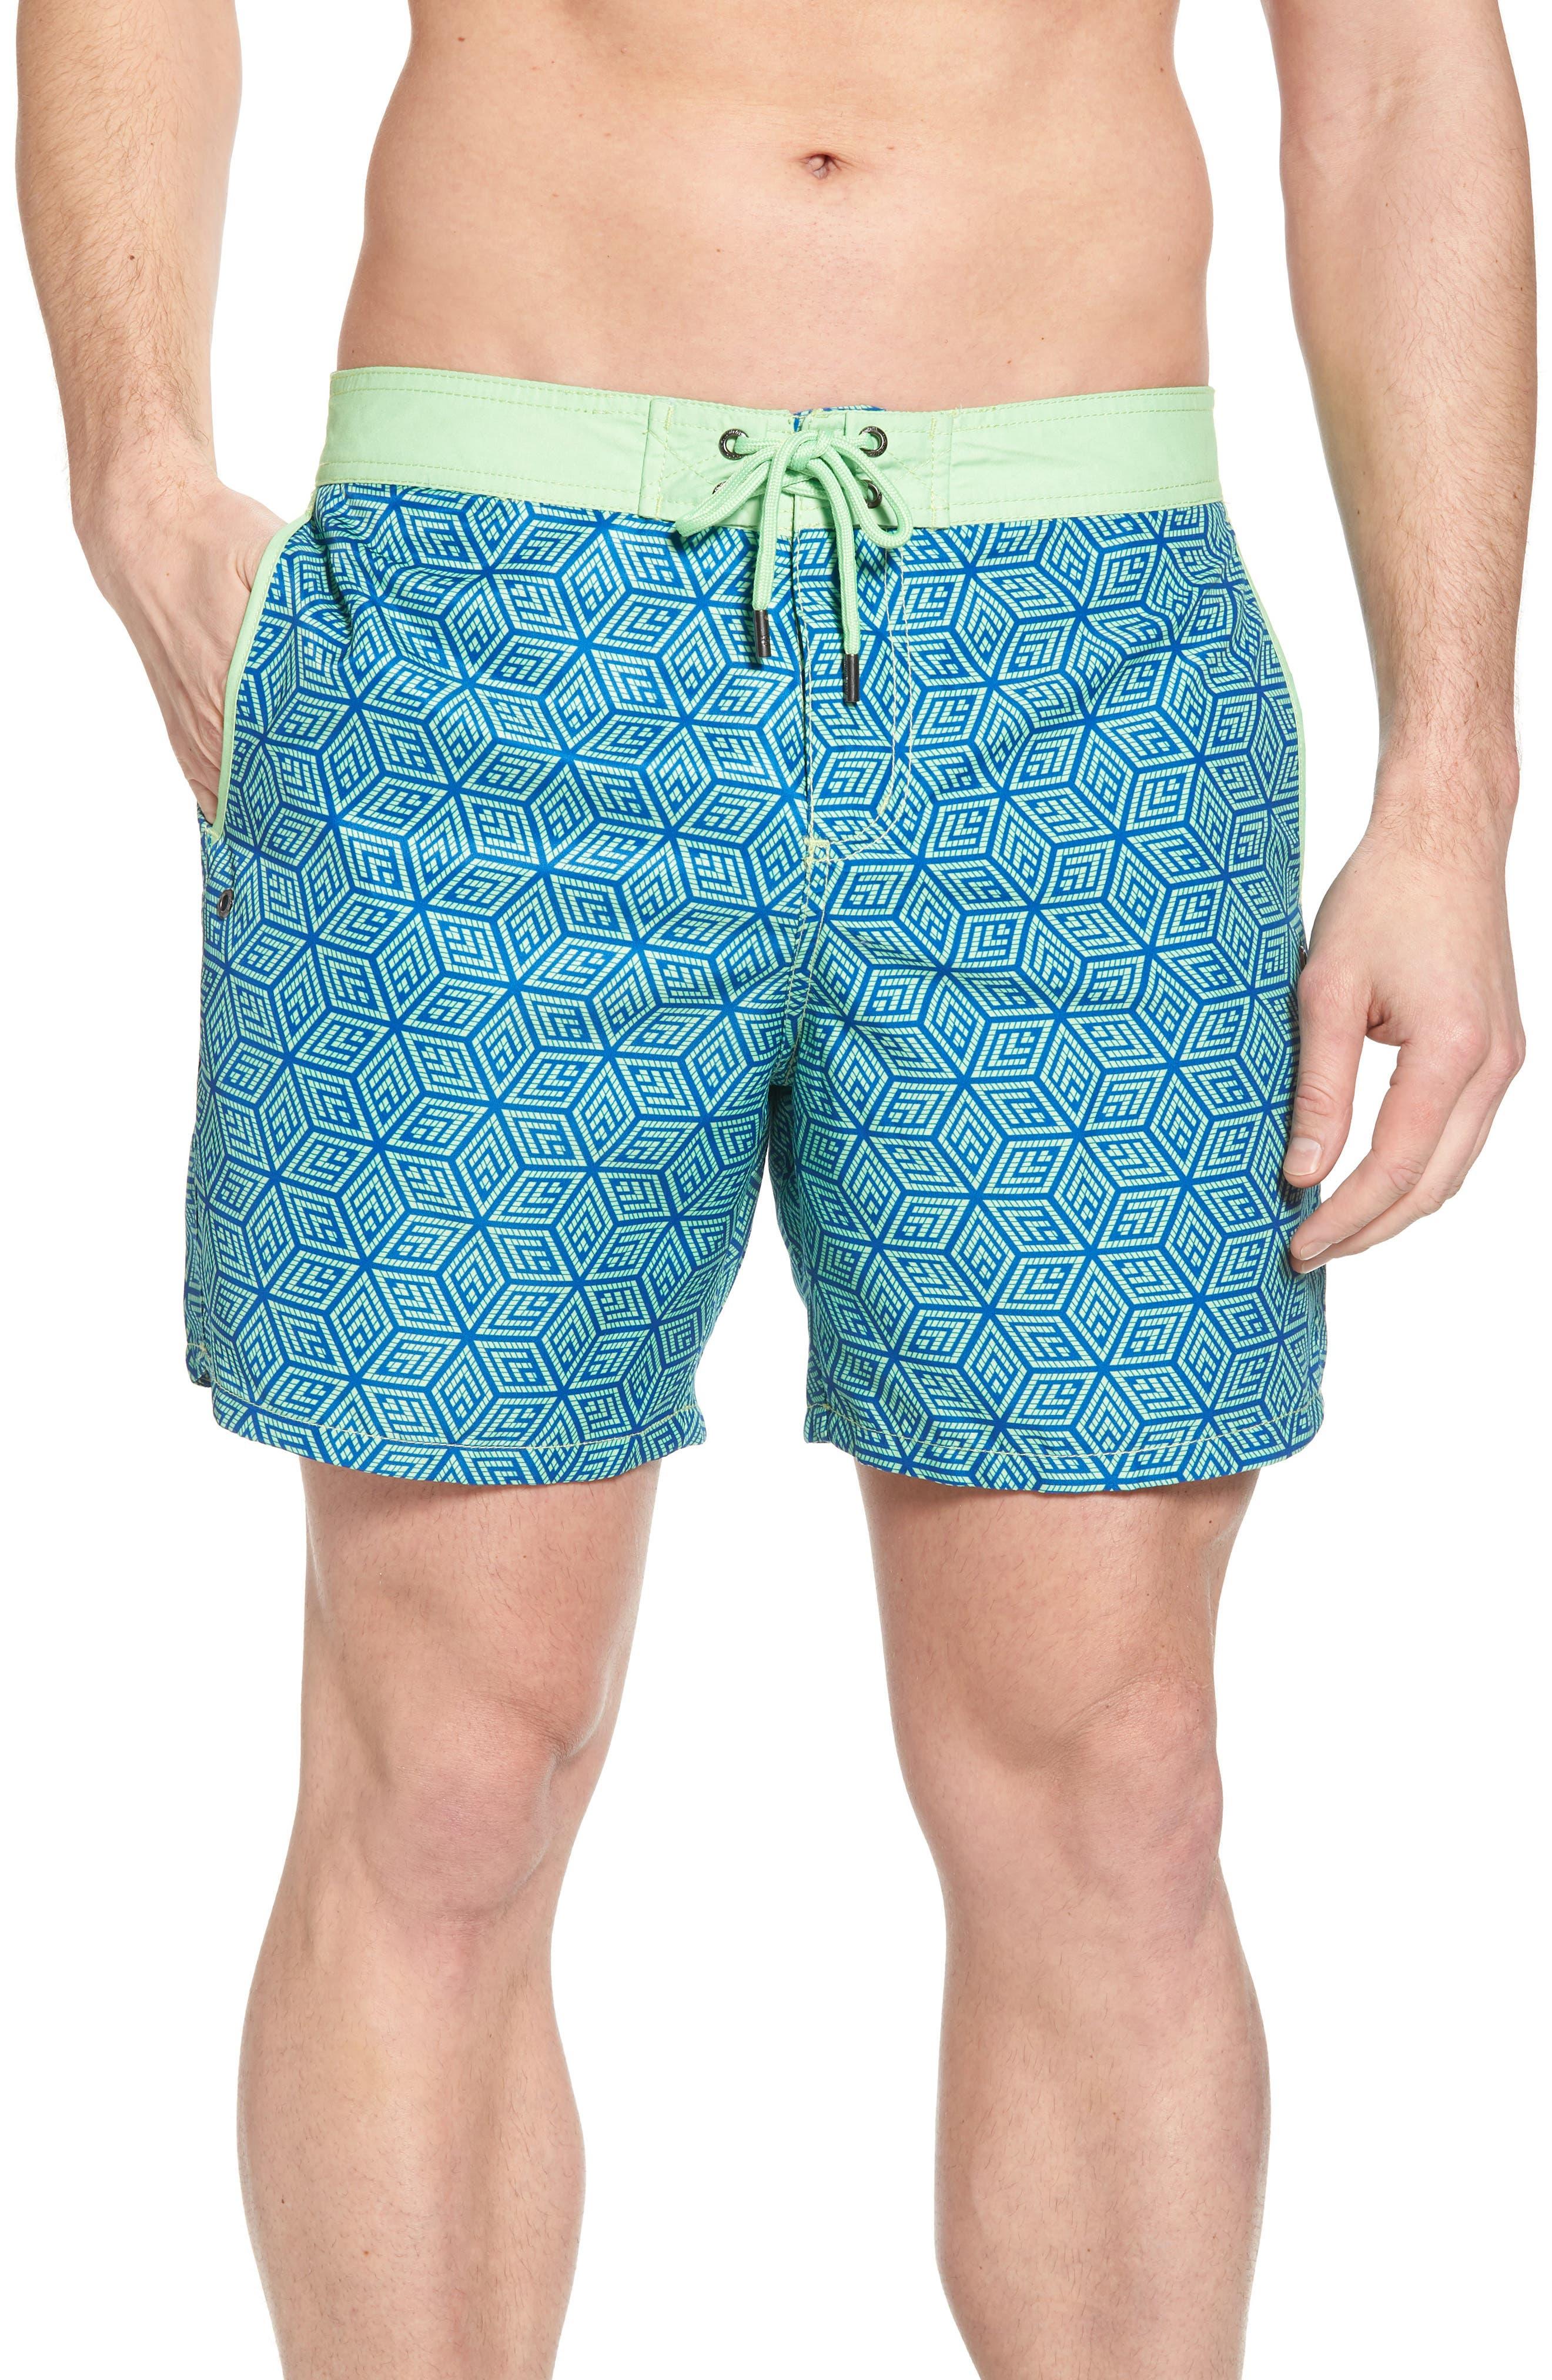 Mr. Swim Geo Print Swim Trunks,                         Main,                         color, Mint